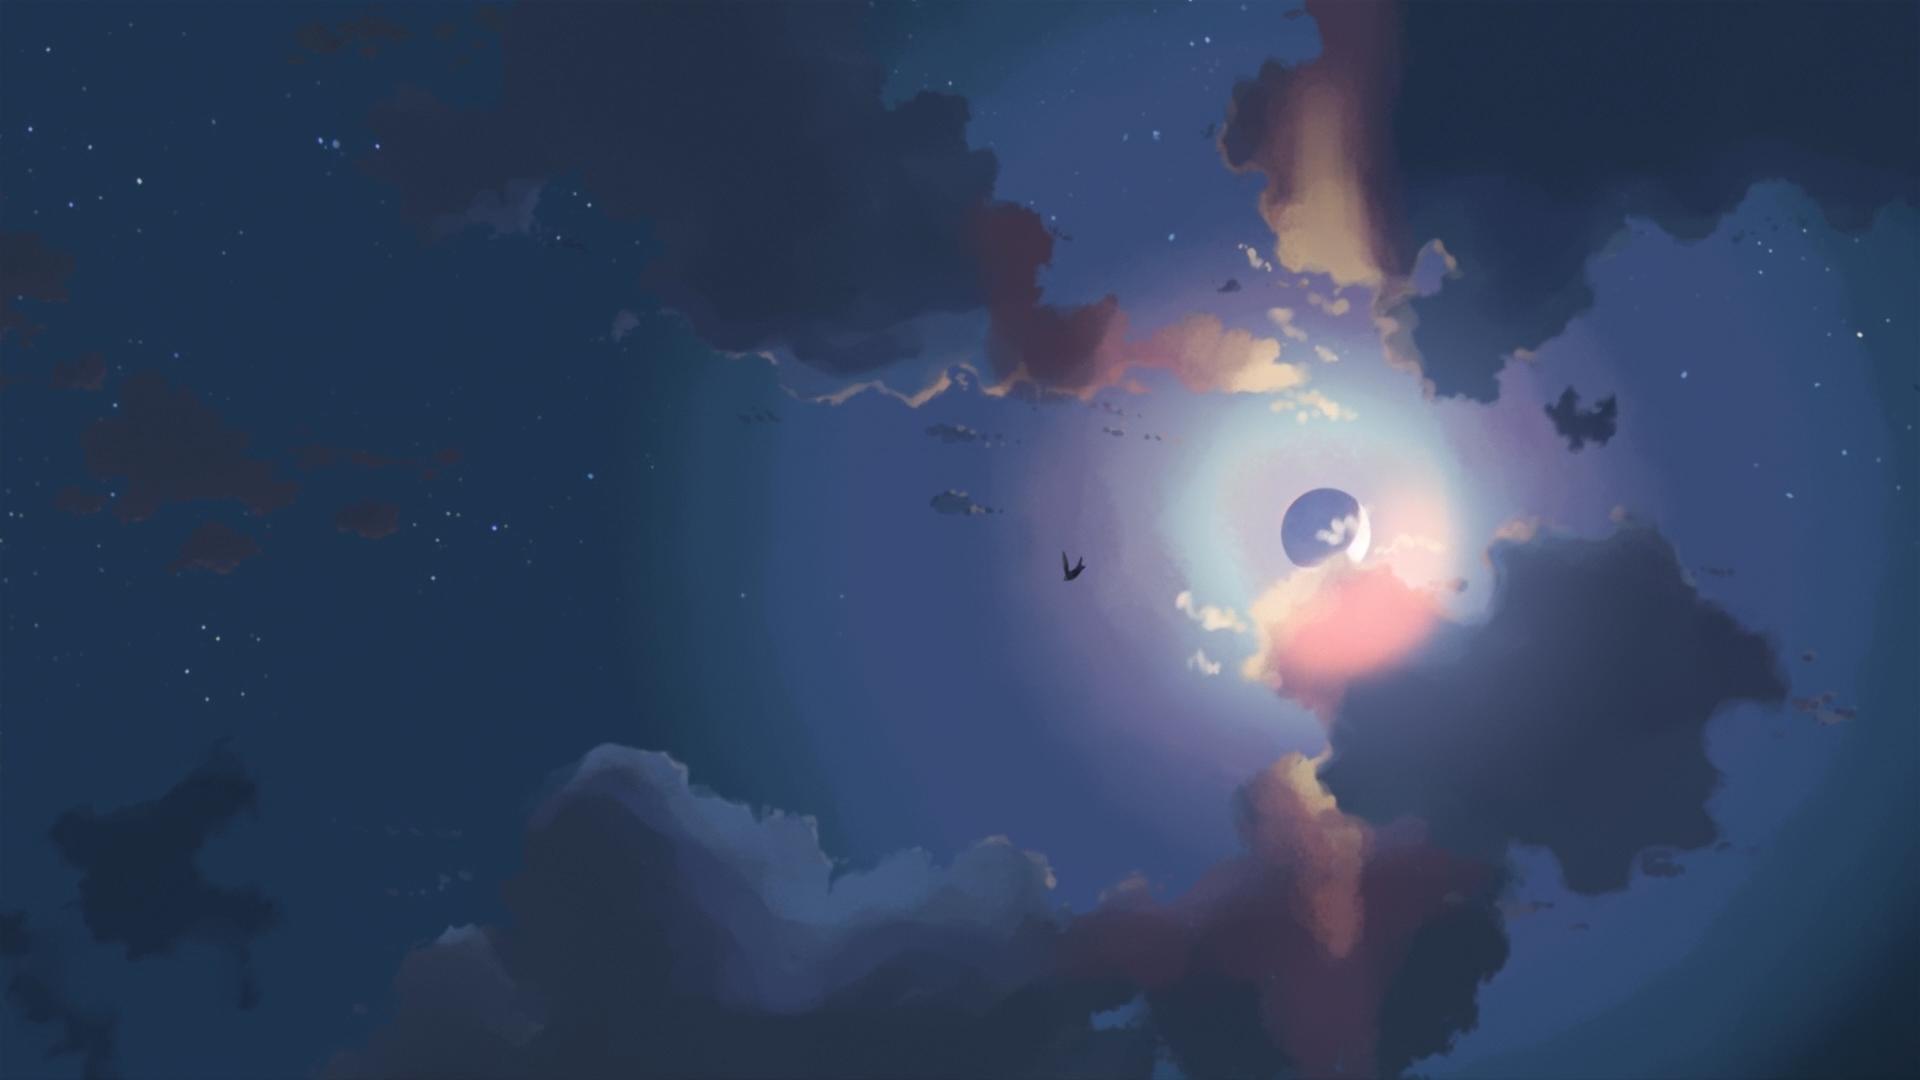 wallpaper : night, artwork, sky, moon, clouds 1920x1080 - mrbror2